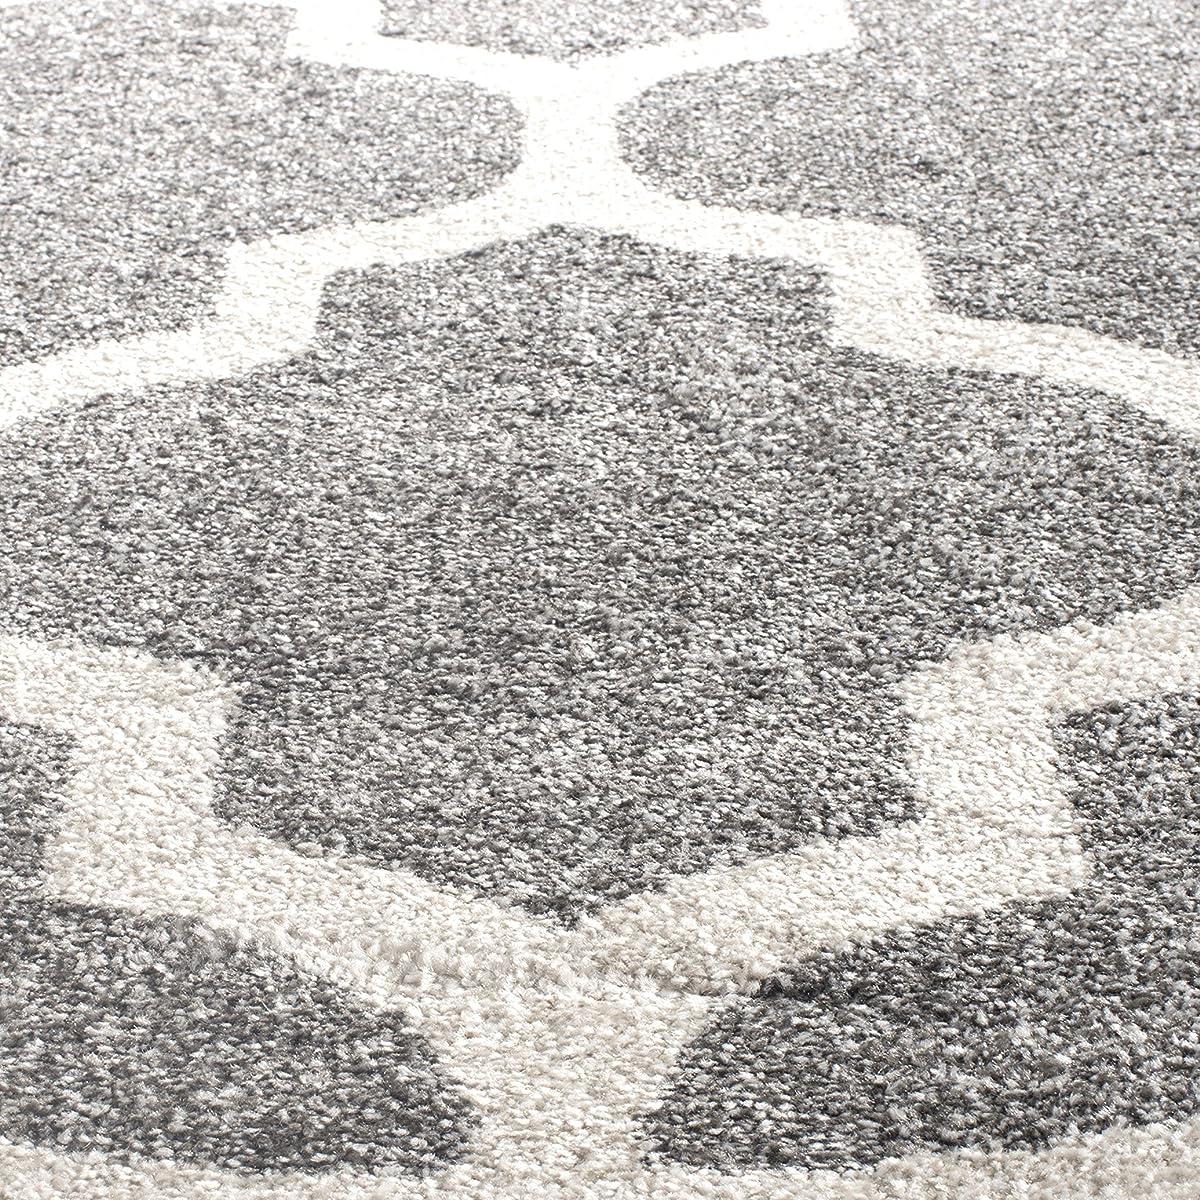 Safavieh Amherst Collection AMT420R Dark Grey and Beige Indoor/ Outdoor Round Area Rug (5 Diameter)